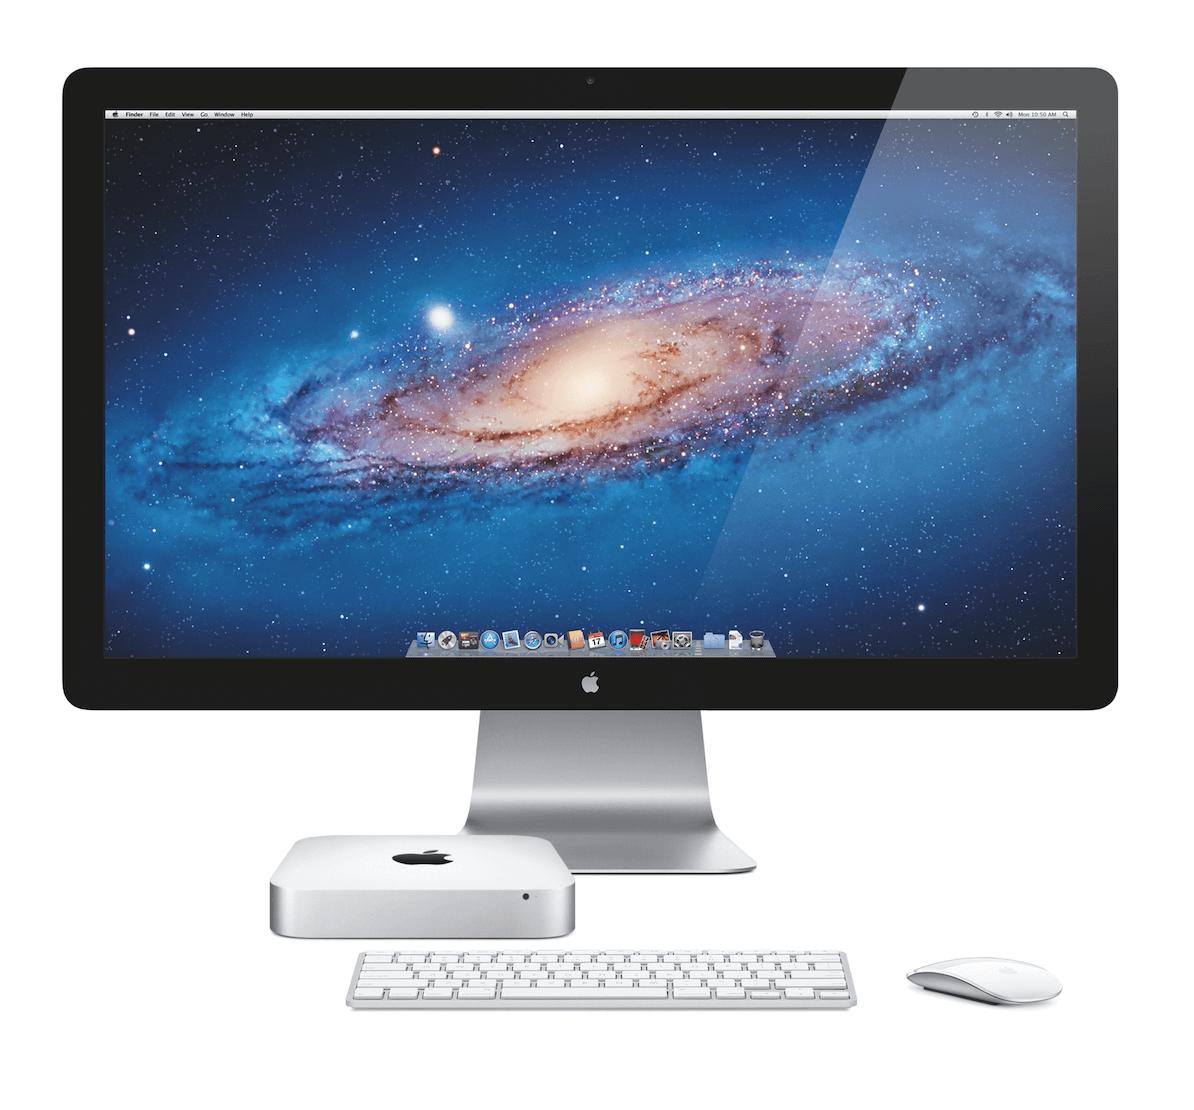 Mac mini 2014: Apple aktualisiert den Mac mini wohl demnächst 1